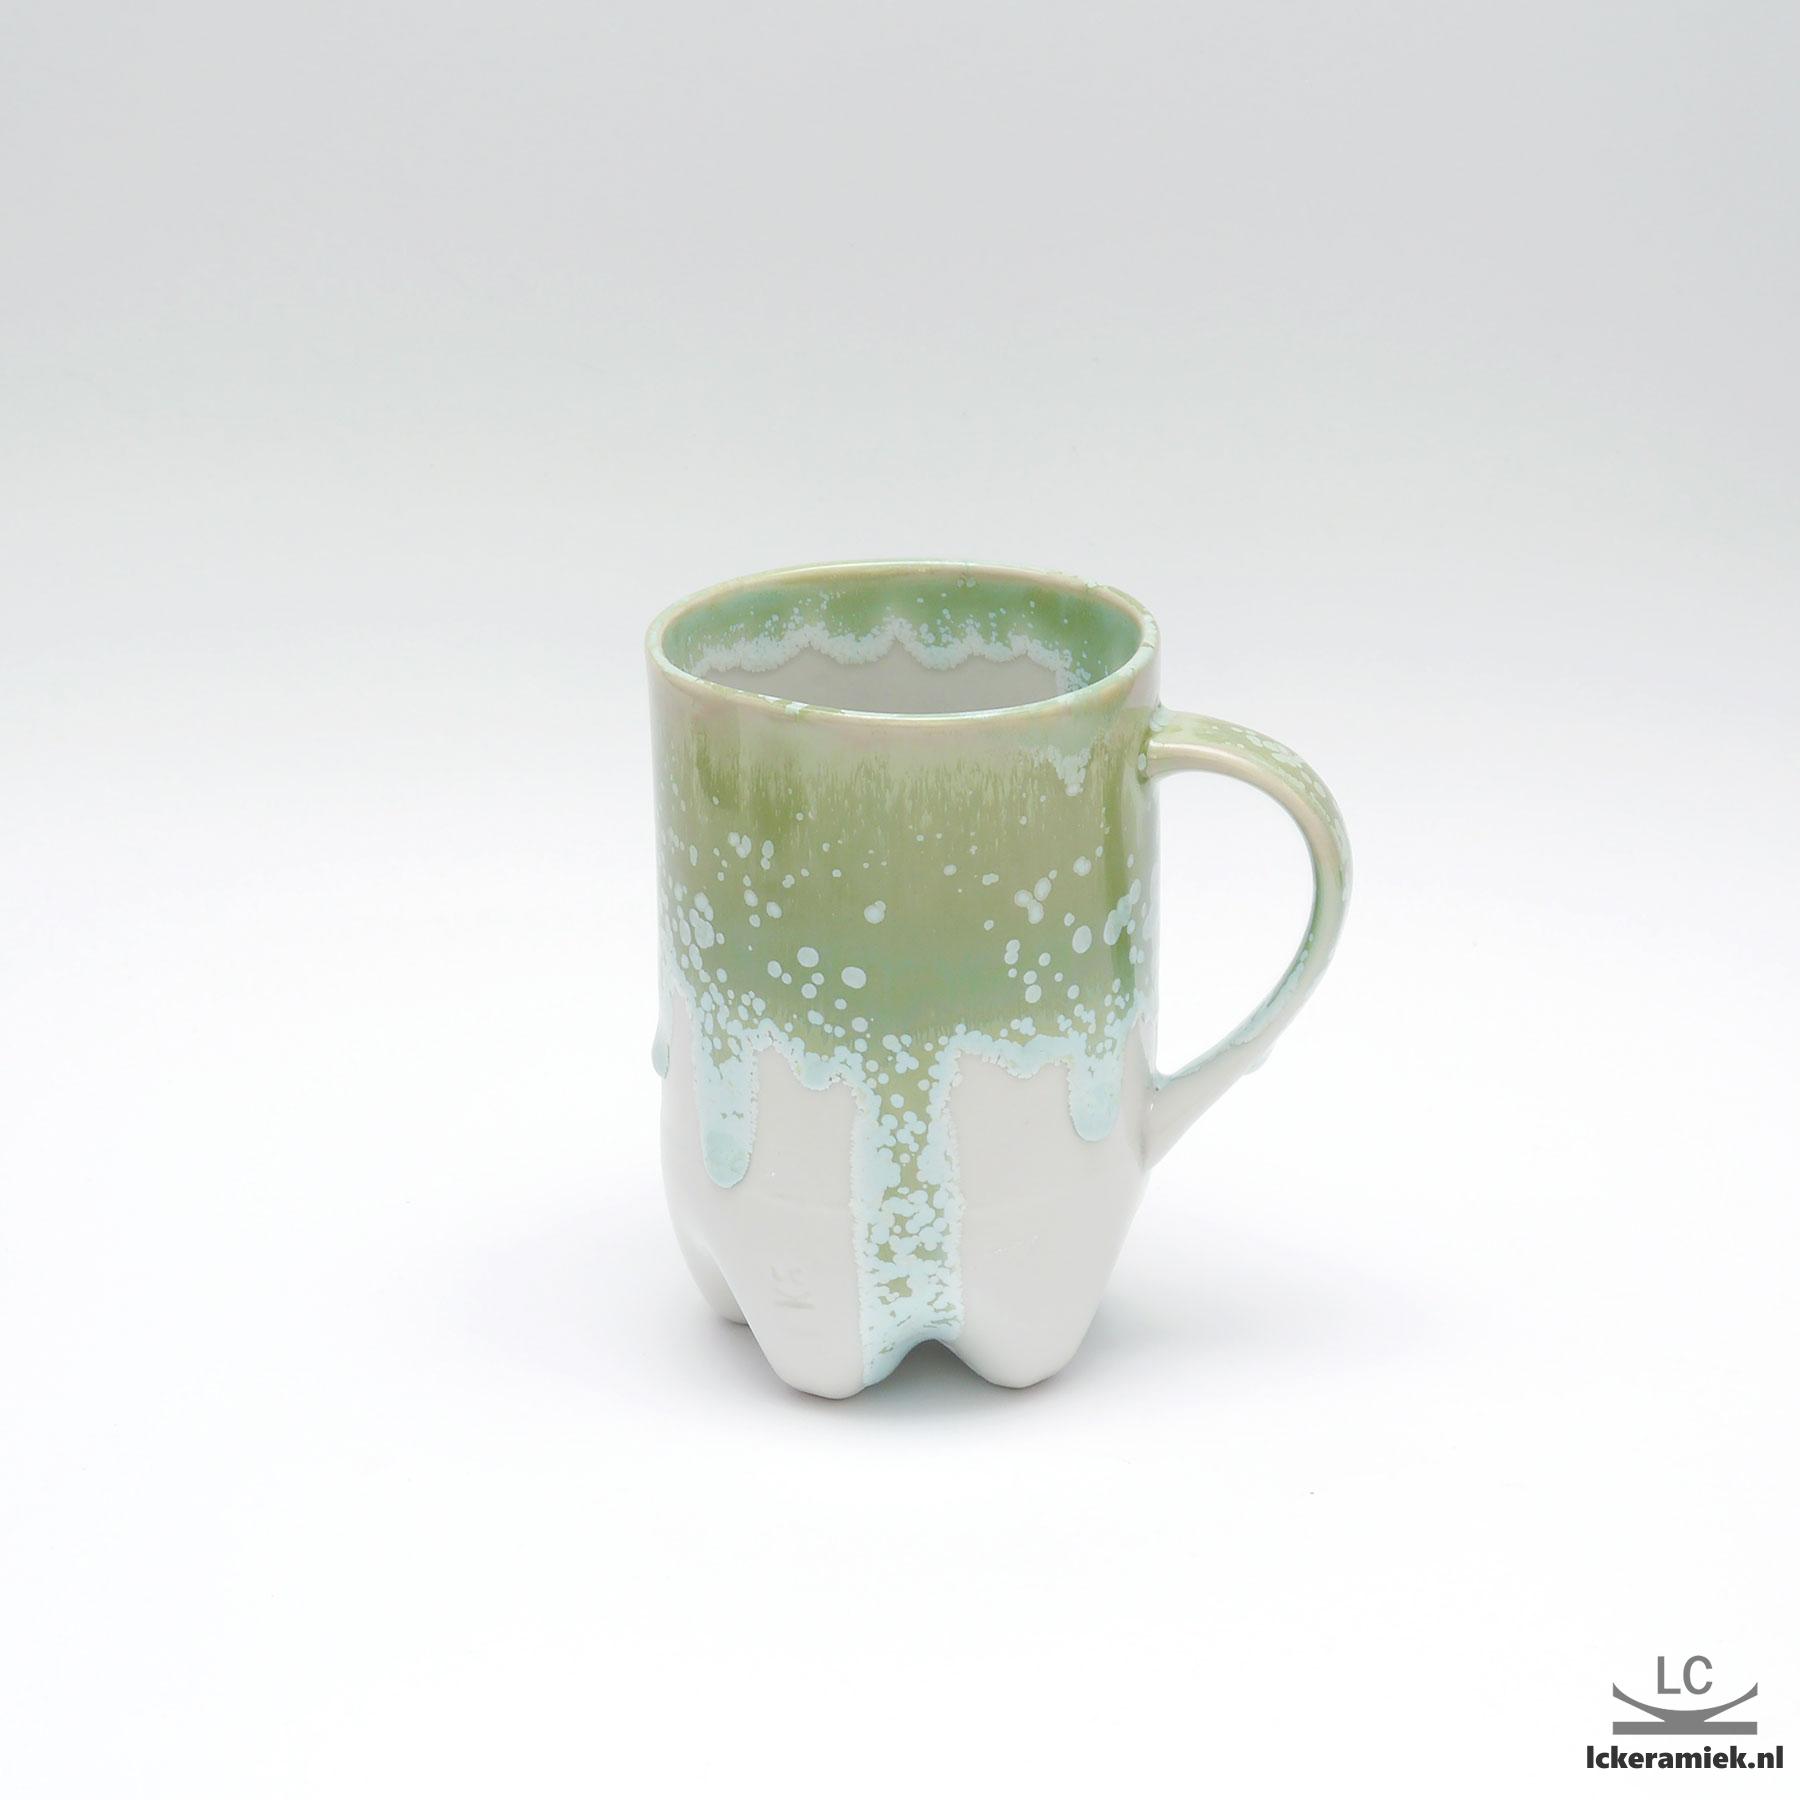 Porseleinen petfles mok groen wit